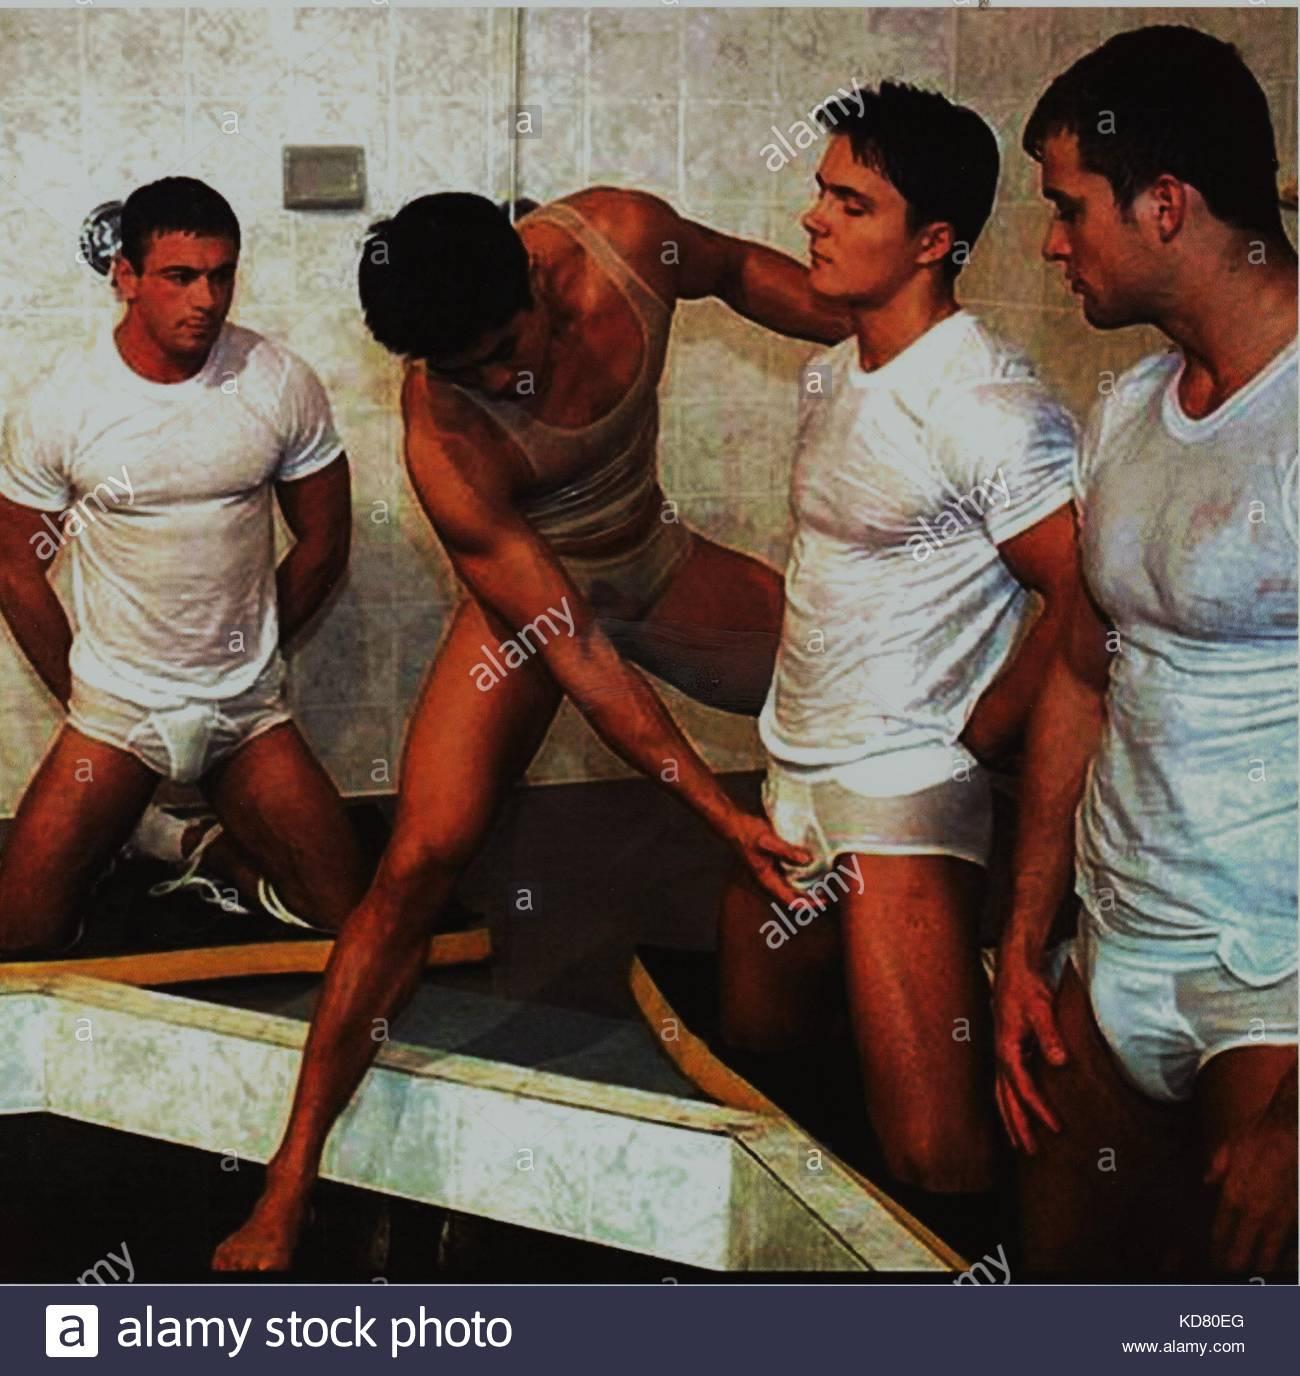 Spice Girls Nude Naked Fakes-Sexe Photo-5171